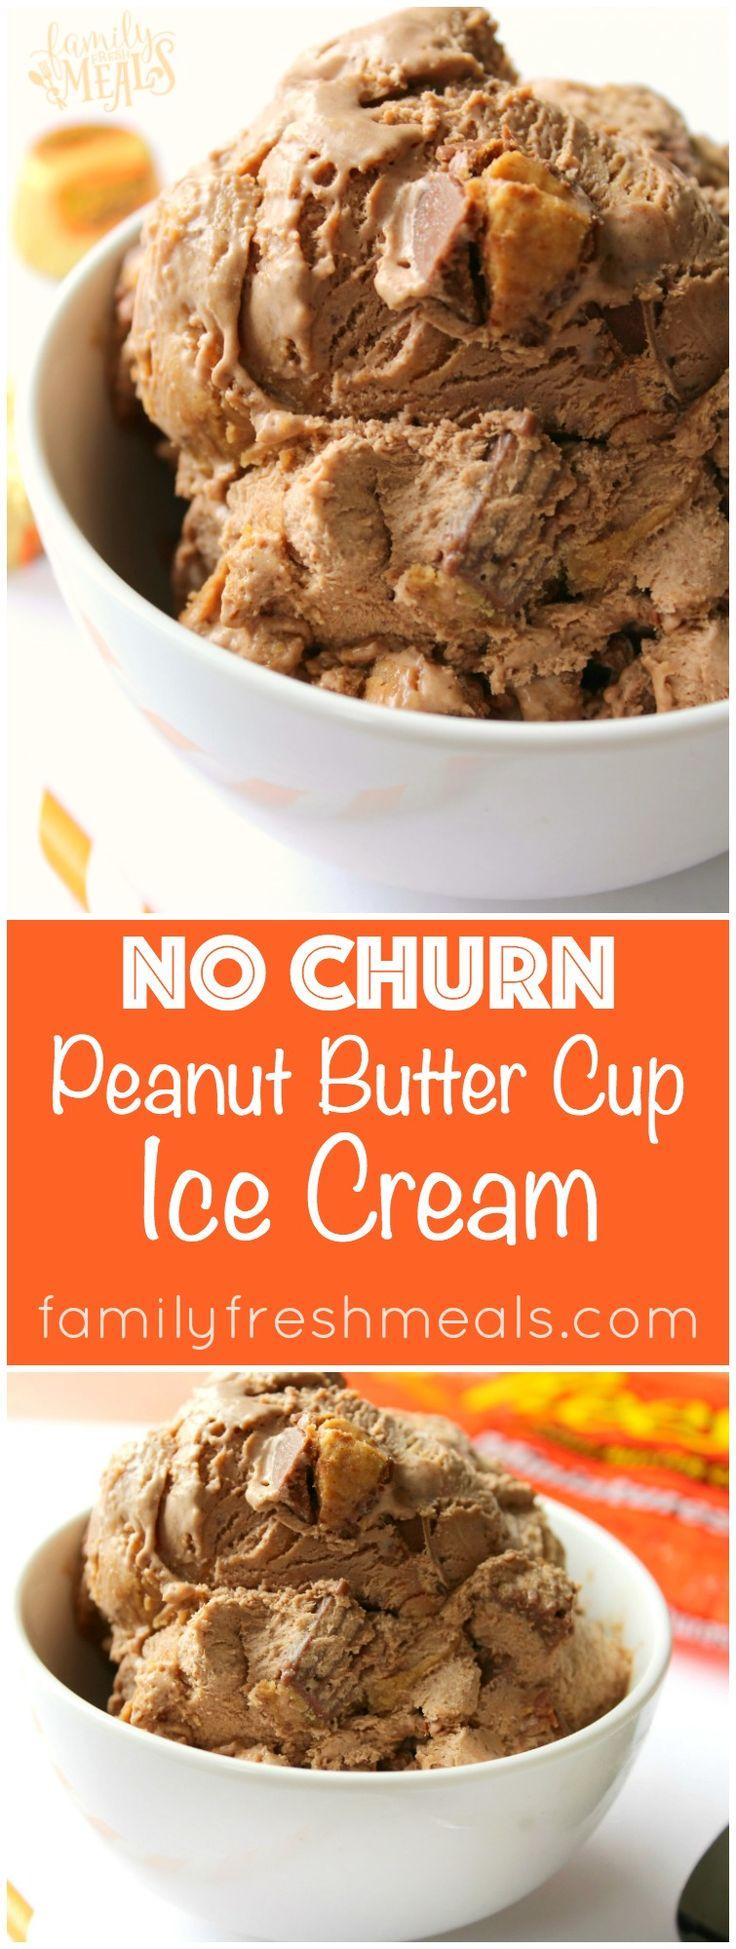 Easy No Churn Peanut Butter Cup Ice Cream Recipe - FamilyFreshMeals.com